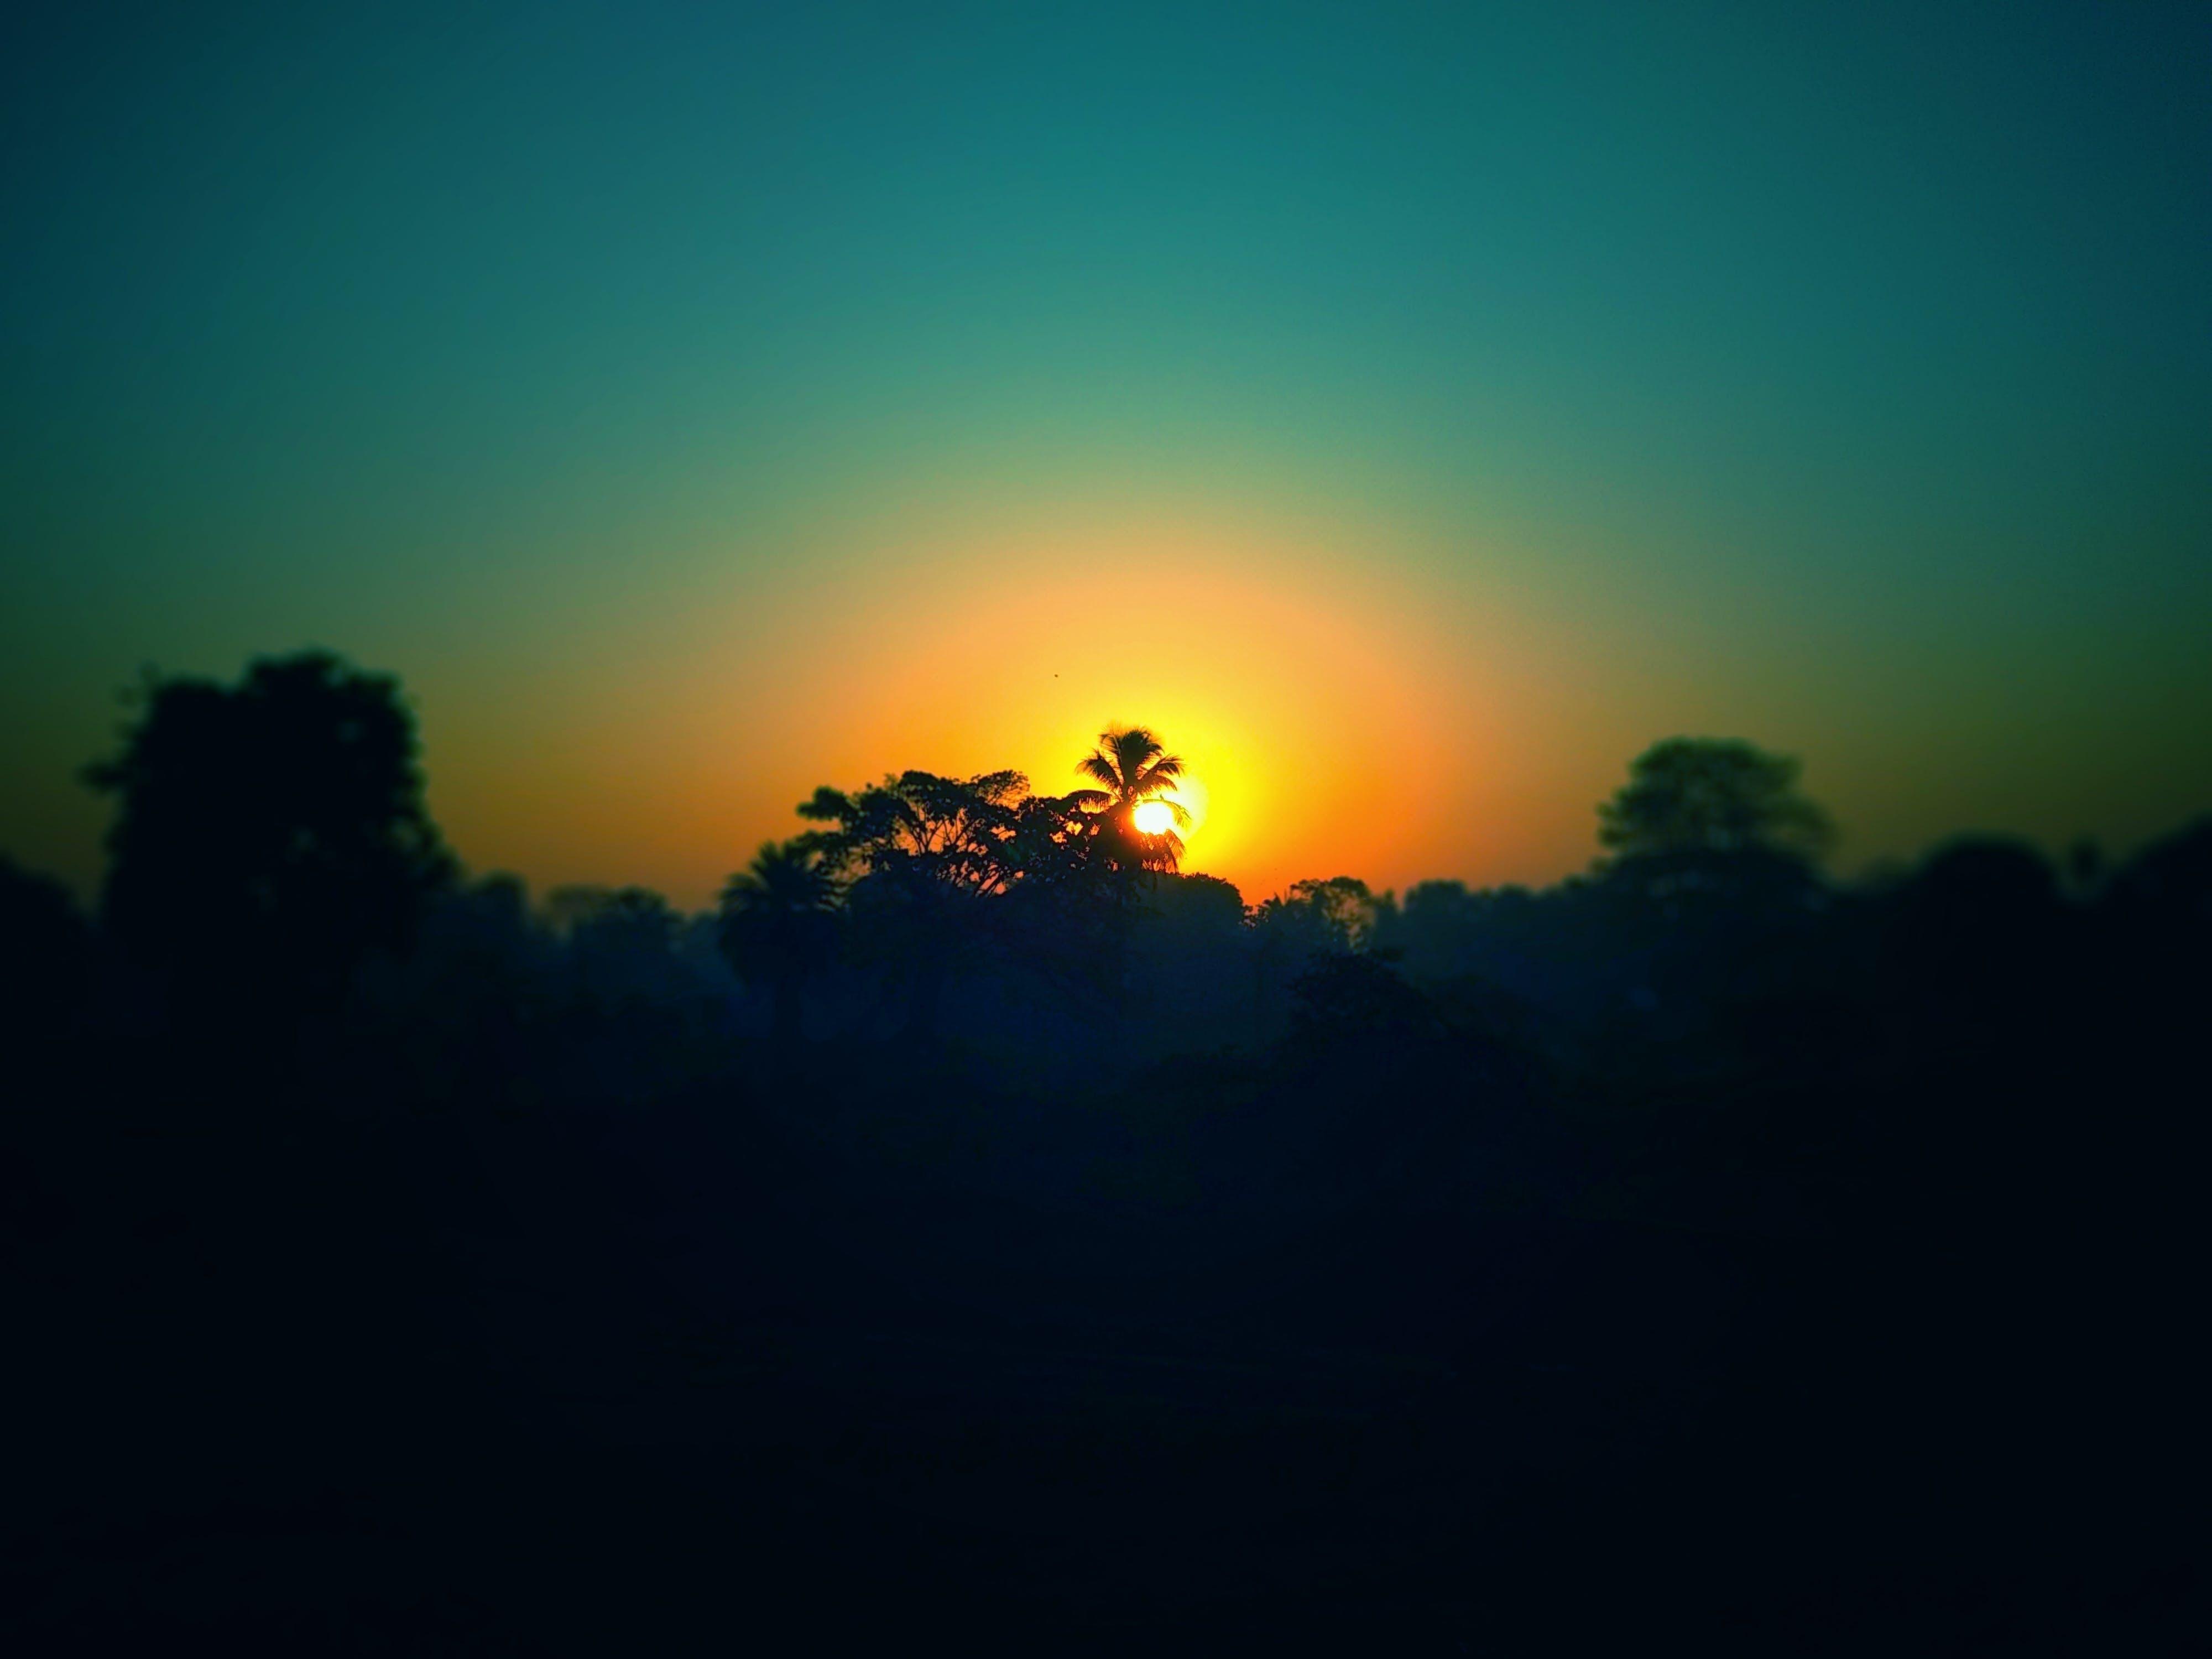 Free stock photo of big tree, blur, border, focus